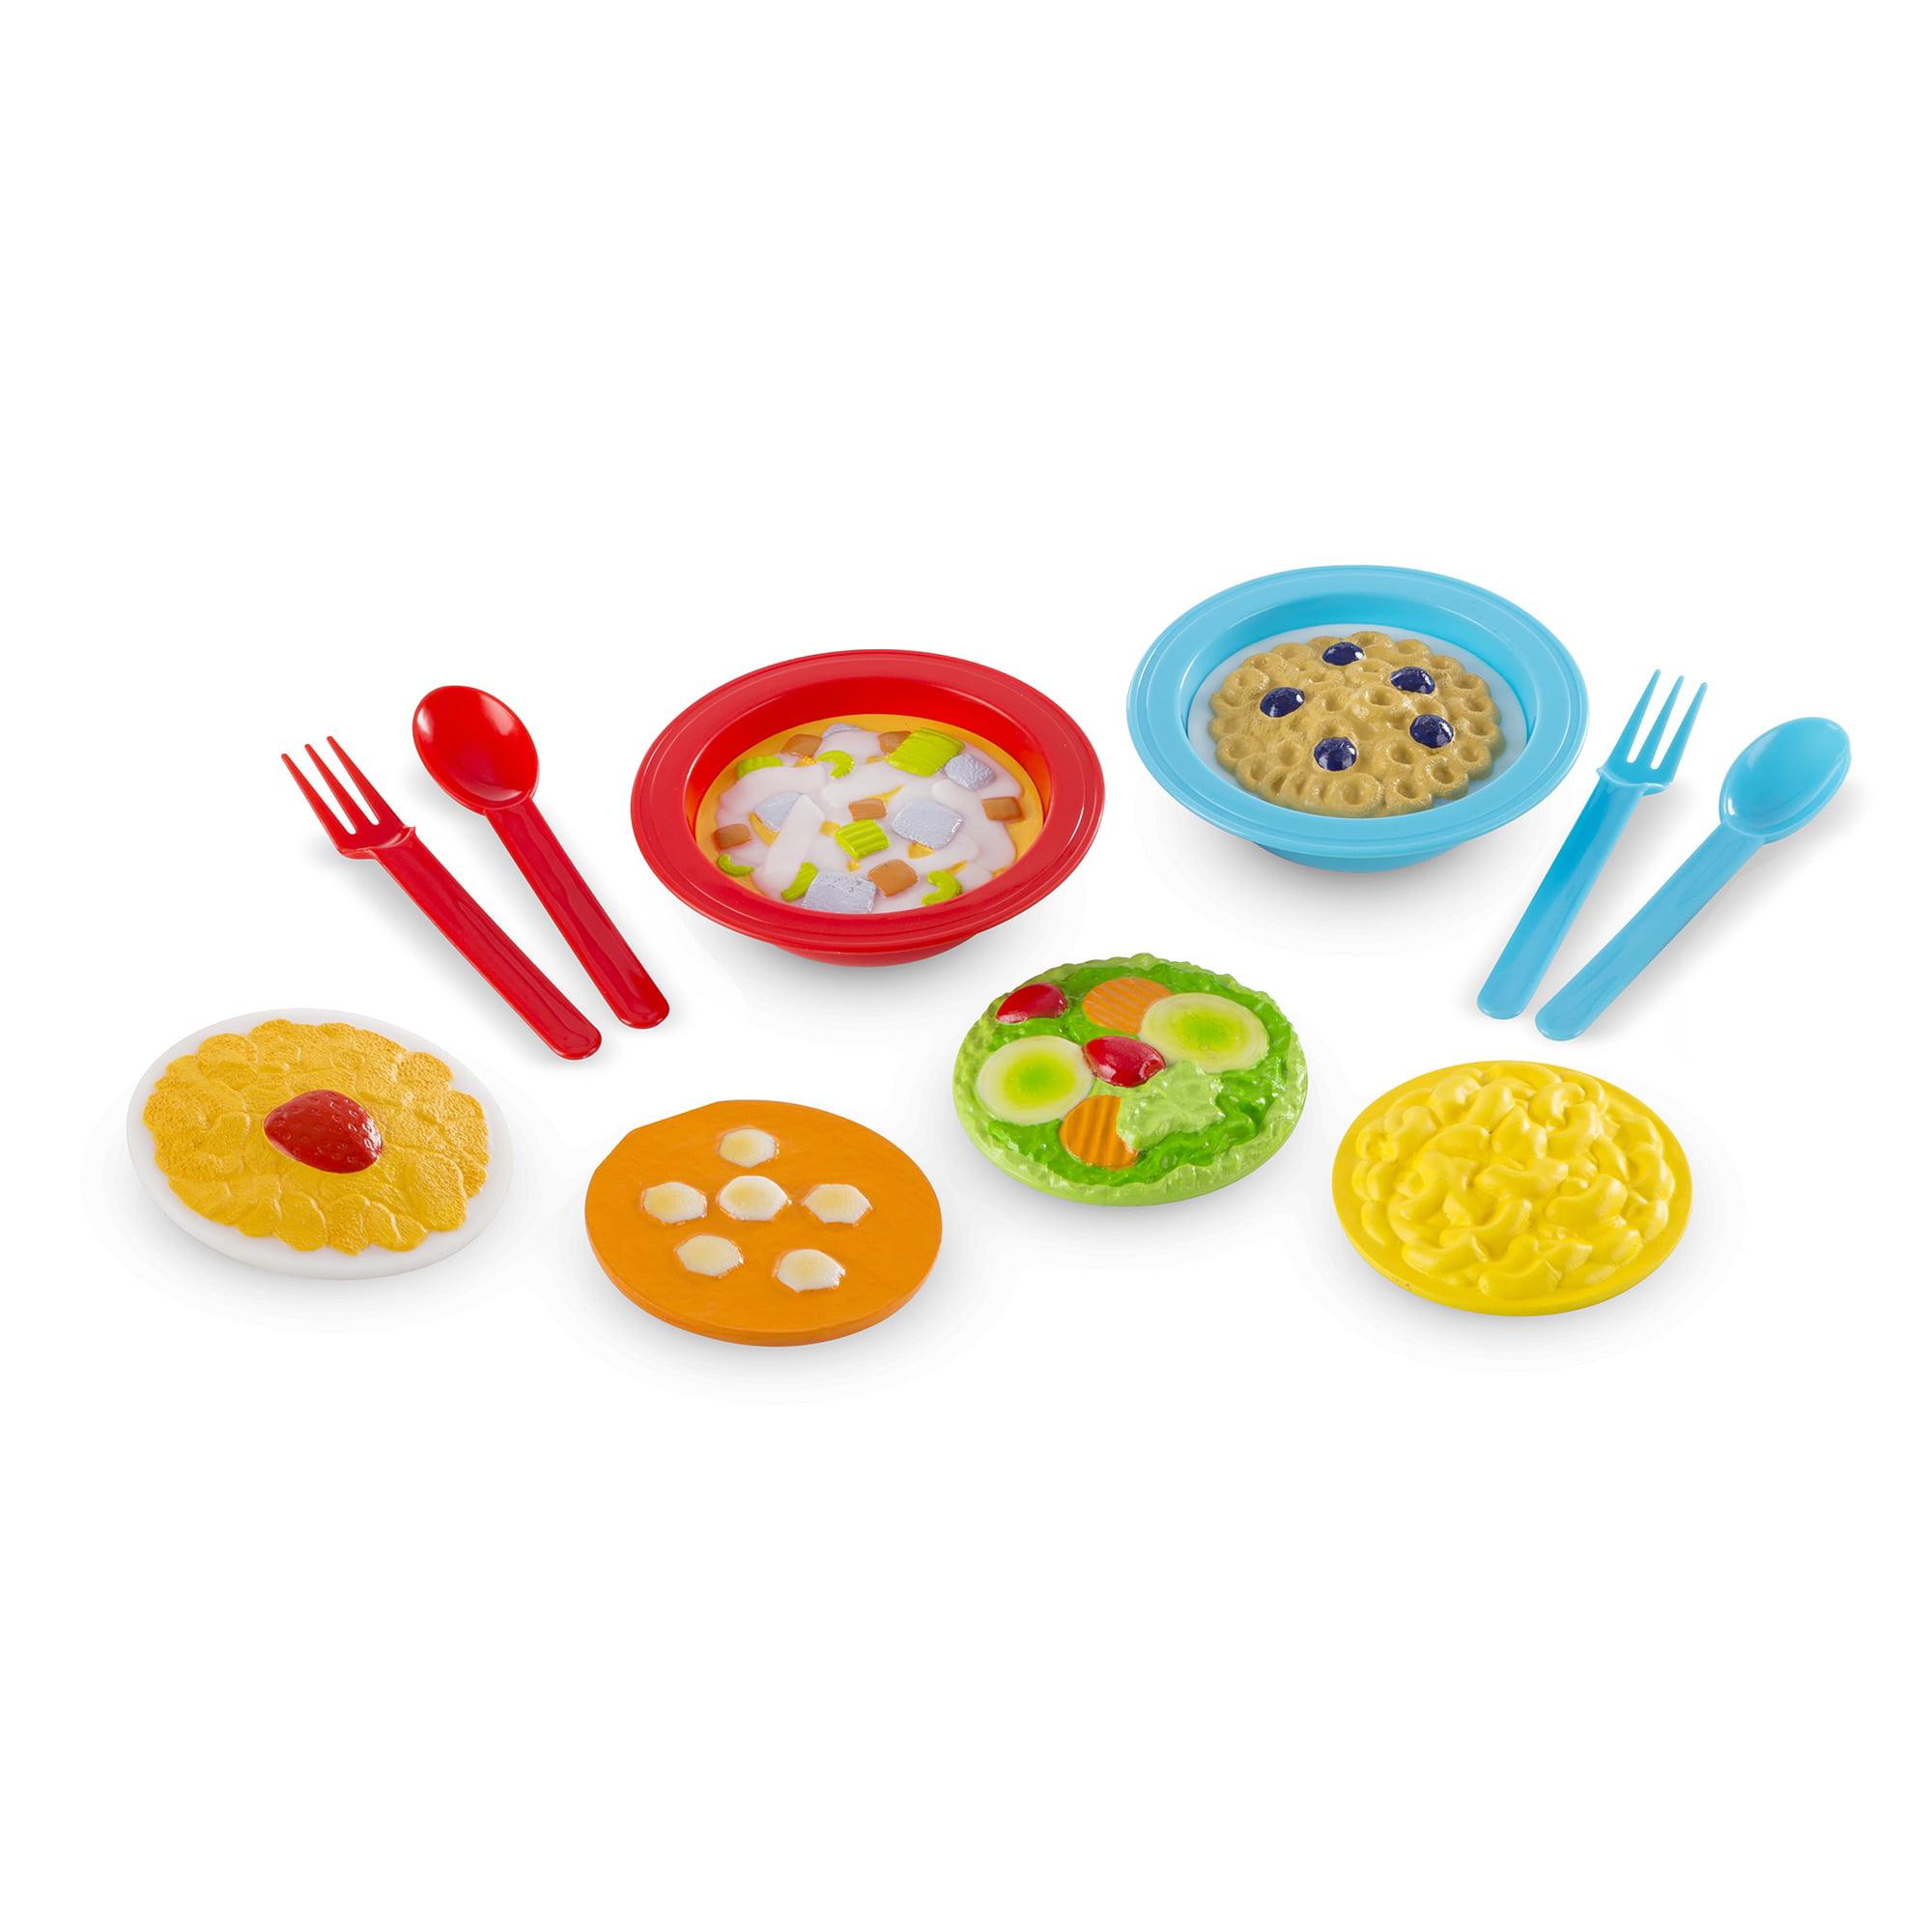 melissa doug create a meal fill em up bowls 12 pcs play food